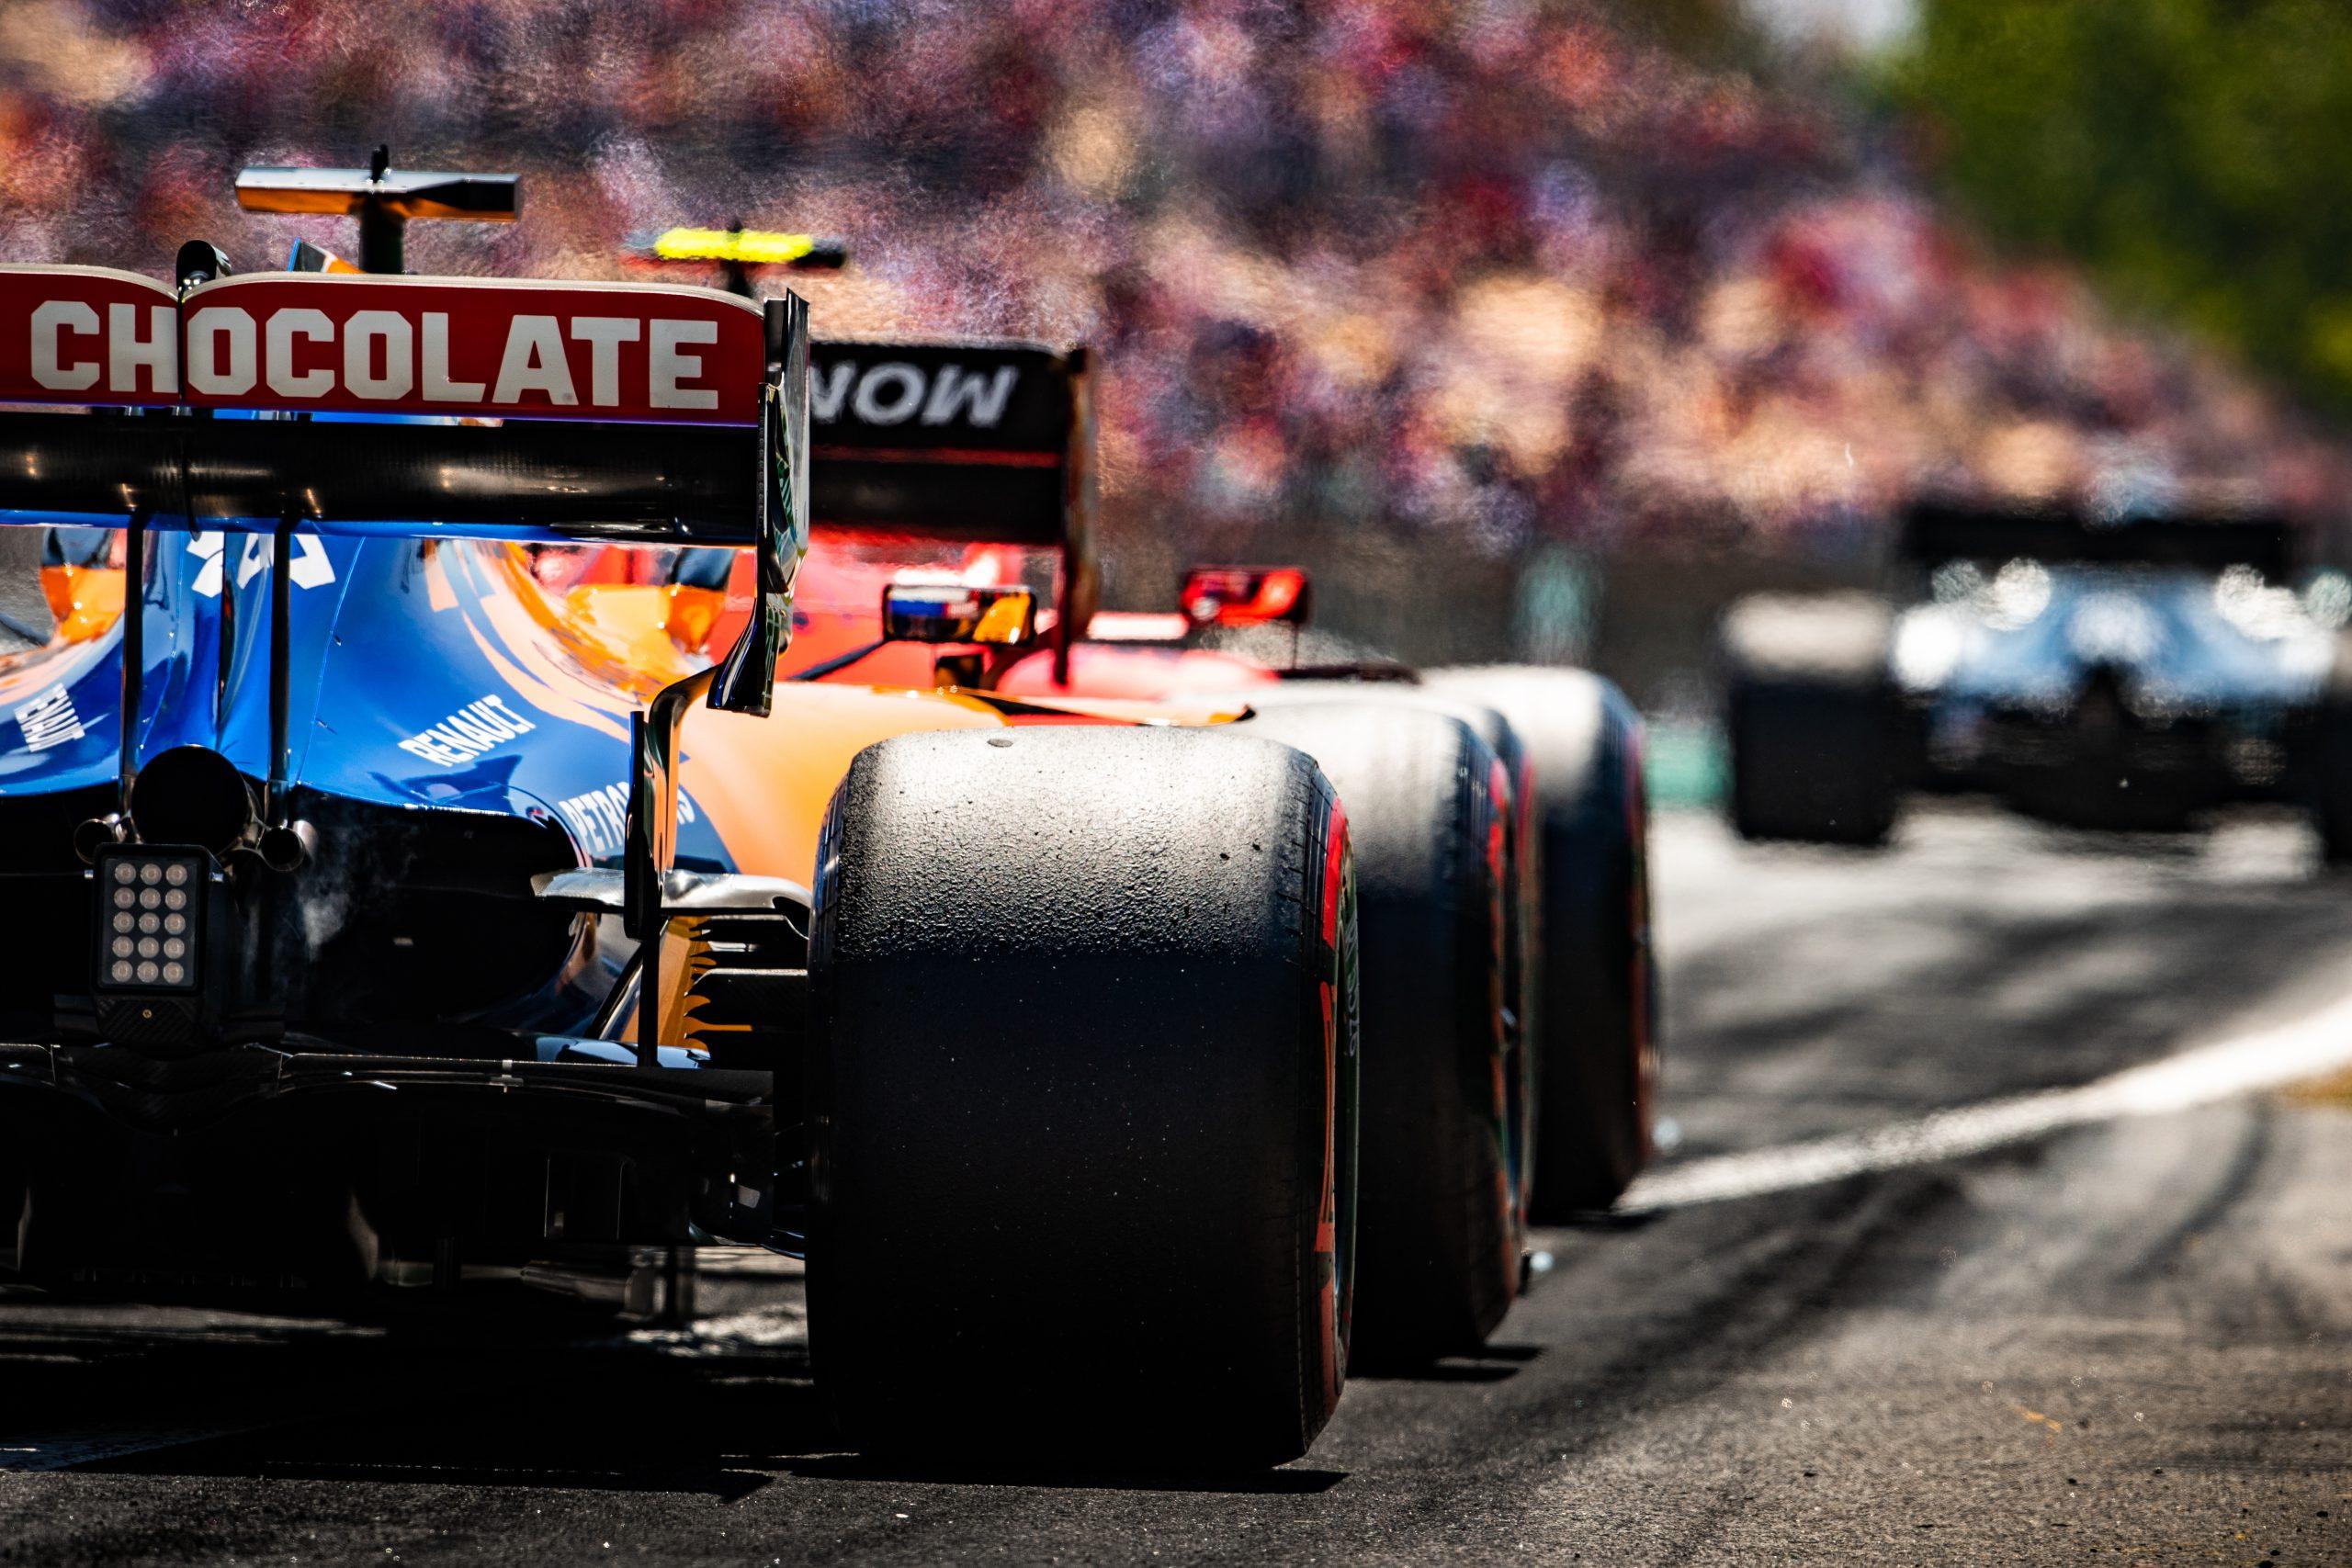 F1 – SPAIN GRAND PRIX 2019